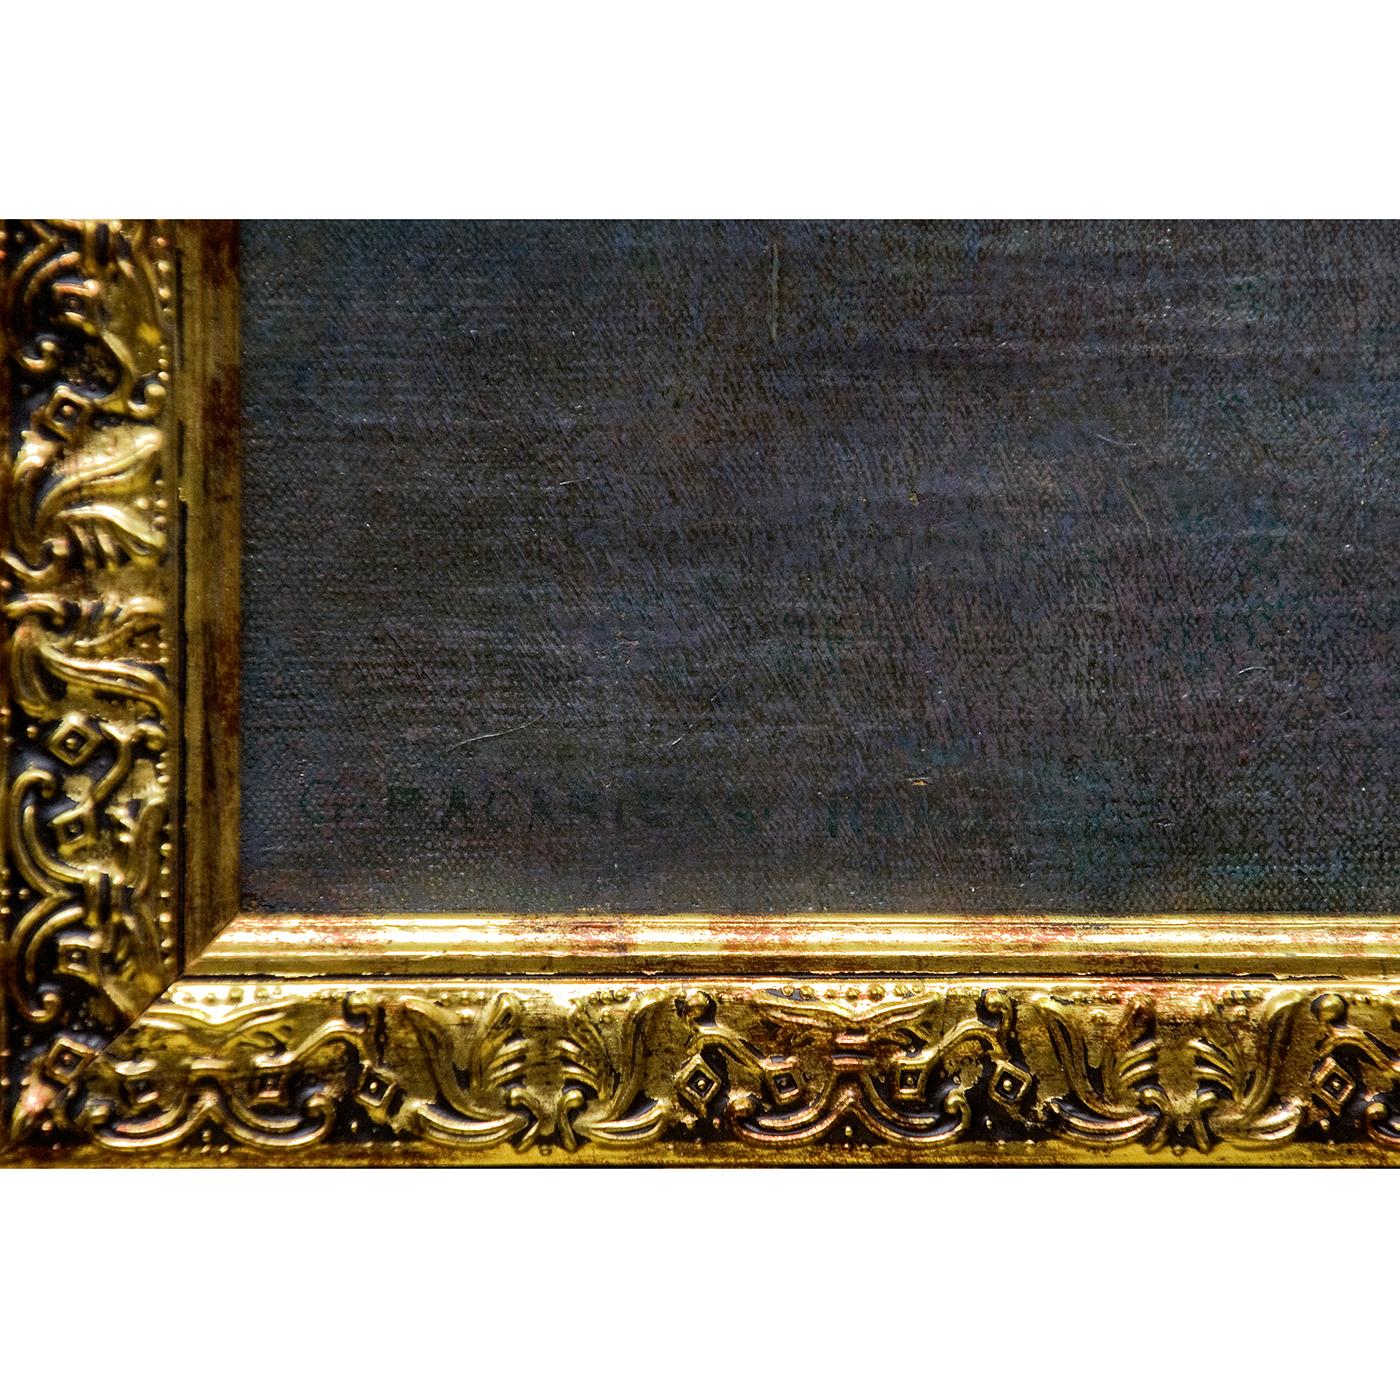 "GUSTAVO BACARISAS. Óleo sobre lienzo. ""Plaza del capitolino""."